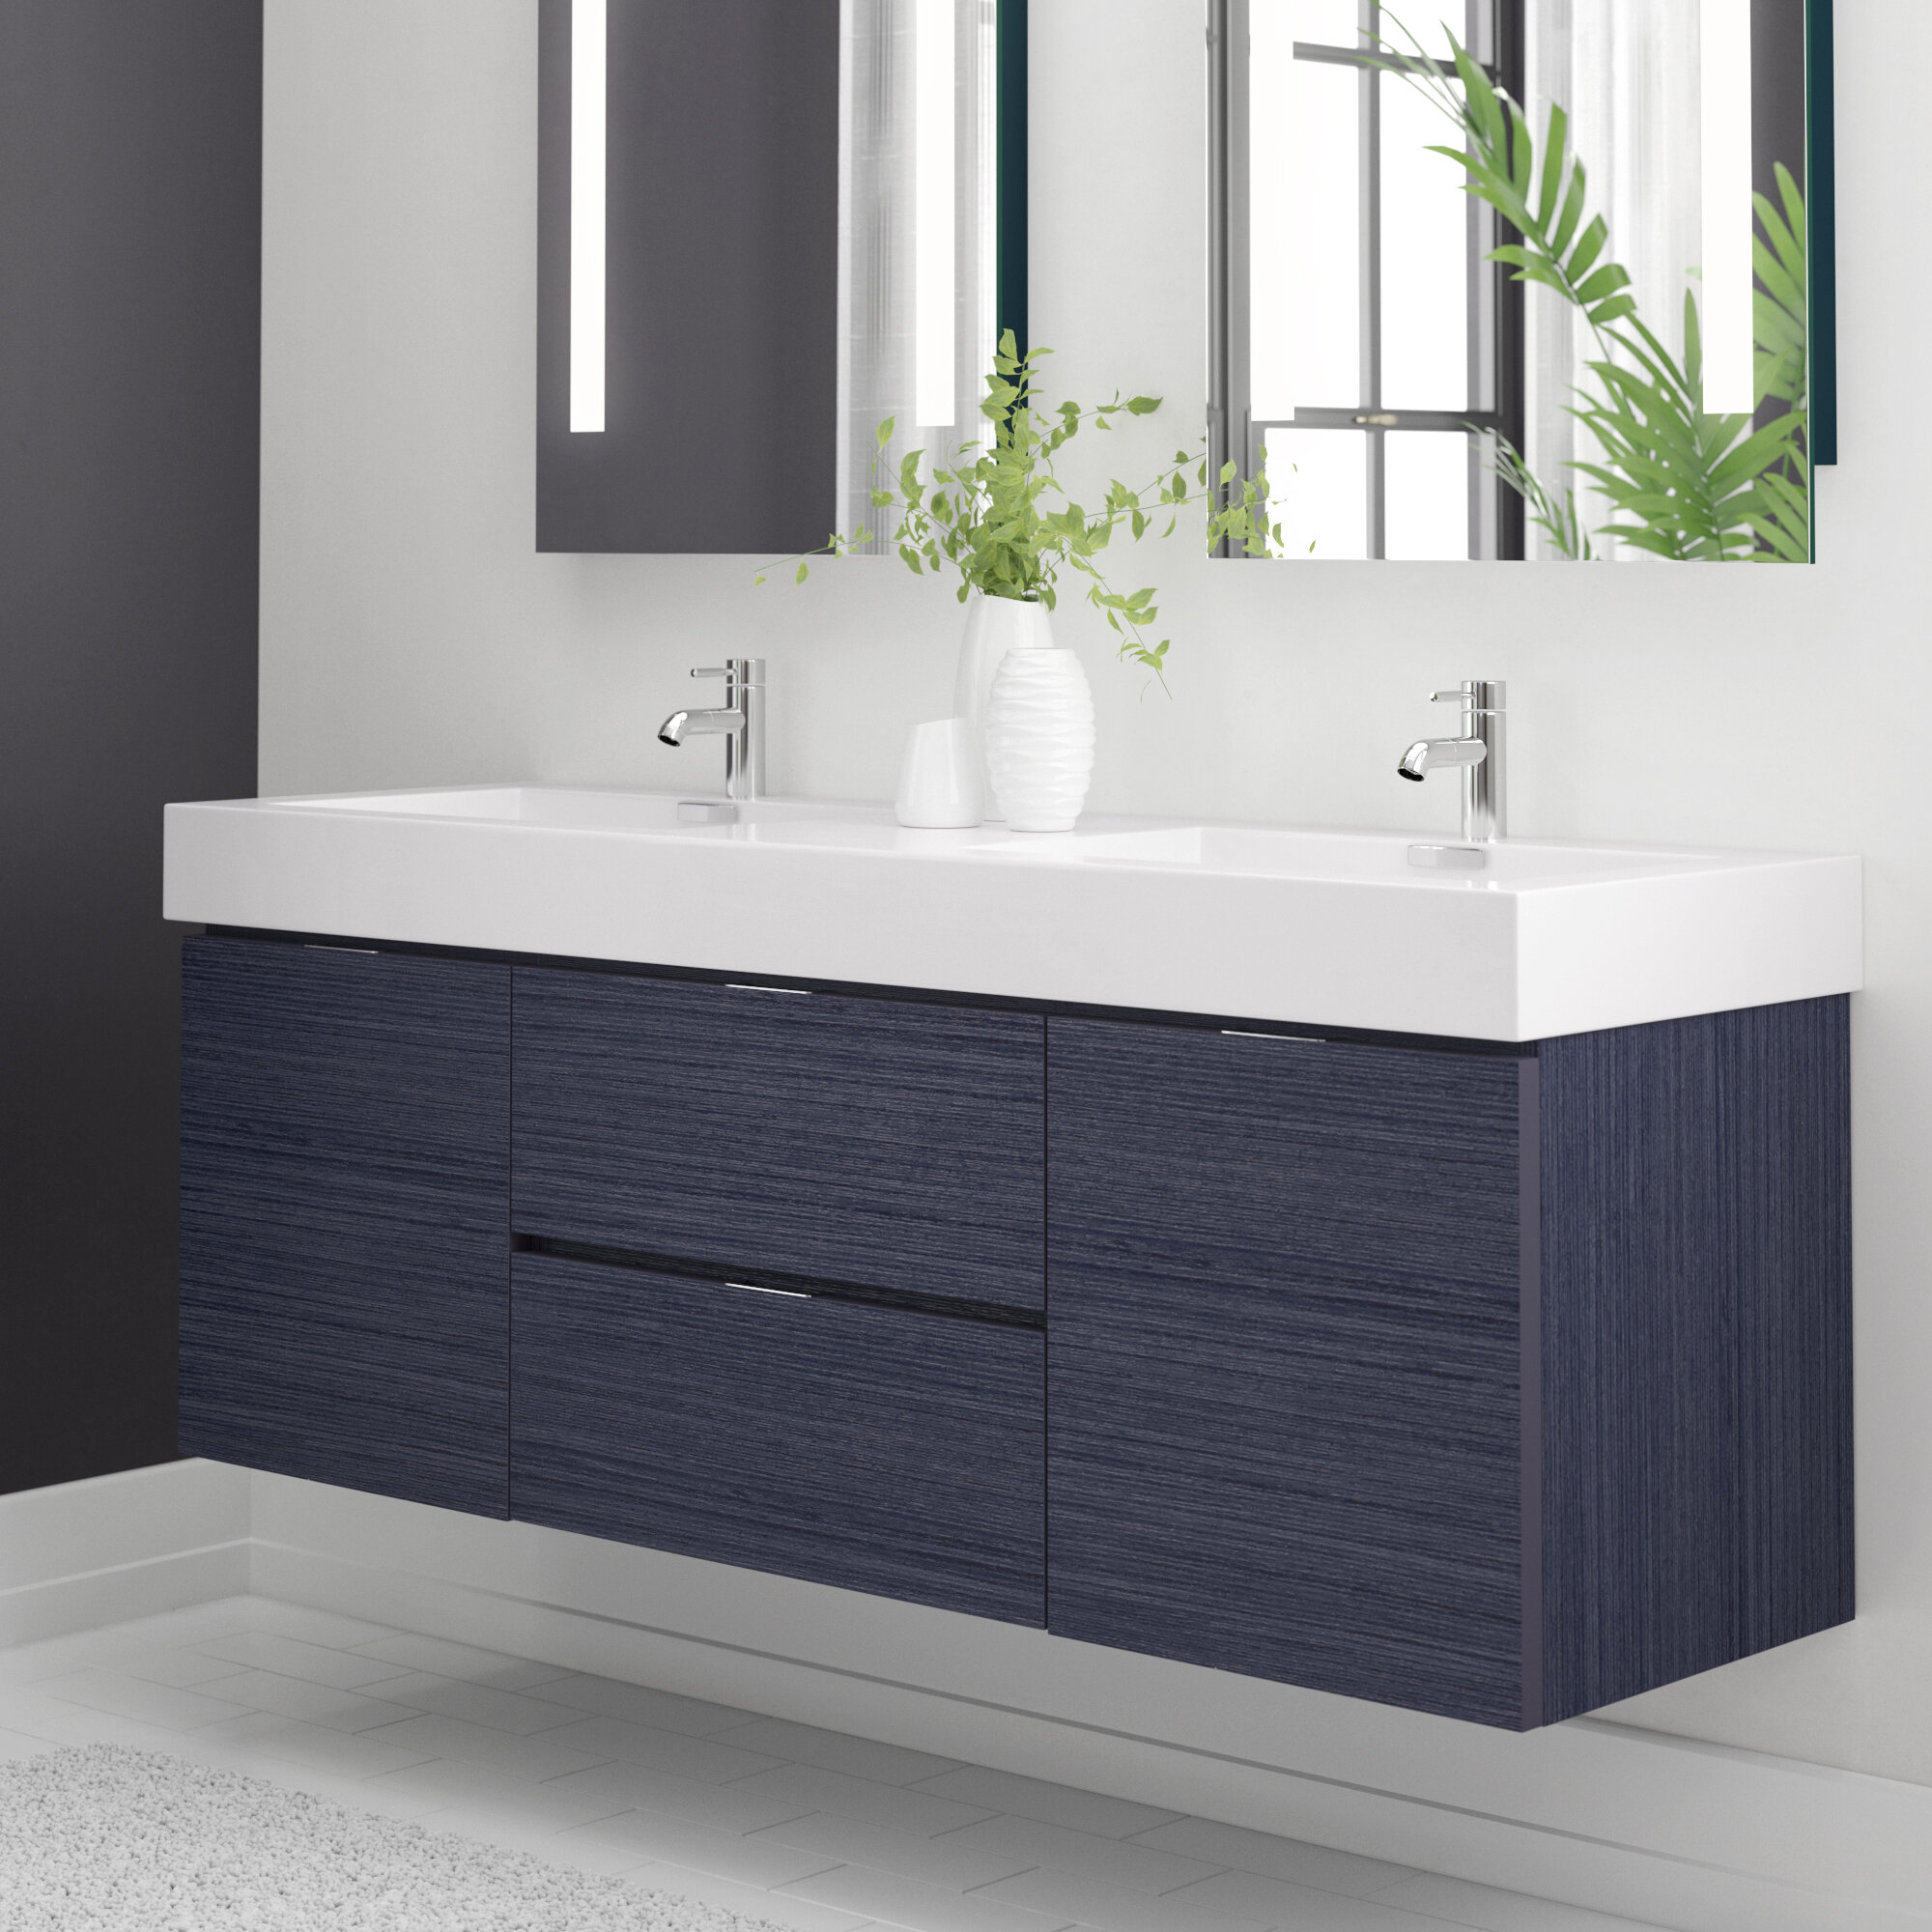 Wade Logan Tenafly 59 Wall Mounted Double Bathroom Vanity Set Reviews Wayfair